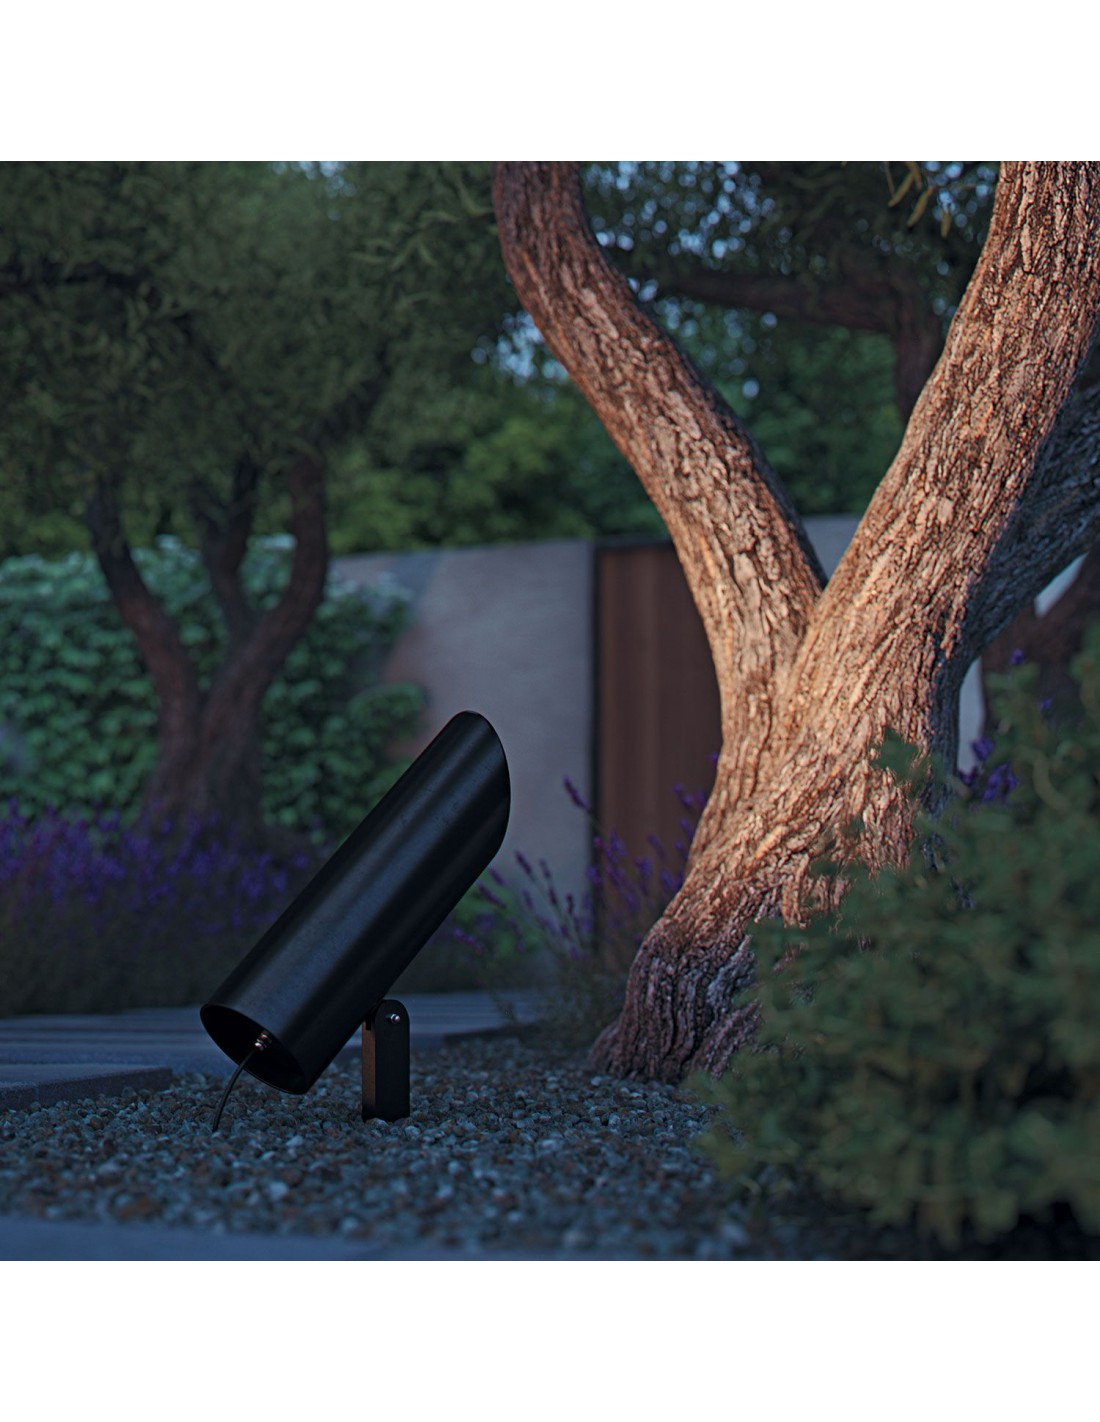 Borne de jardin noire de la marque Royal Botania.